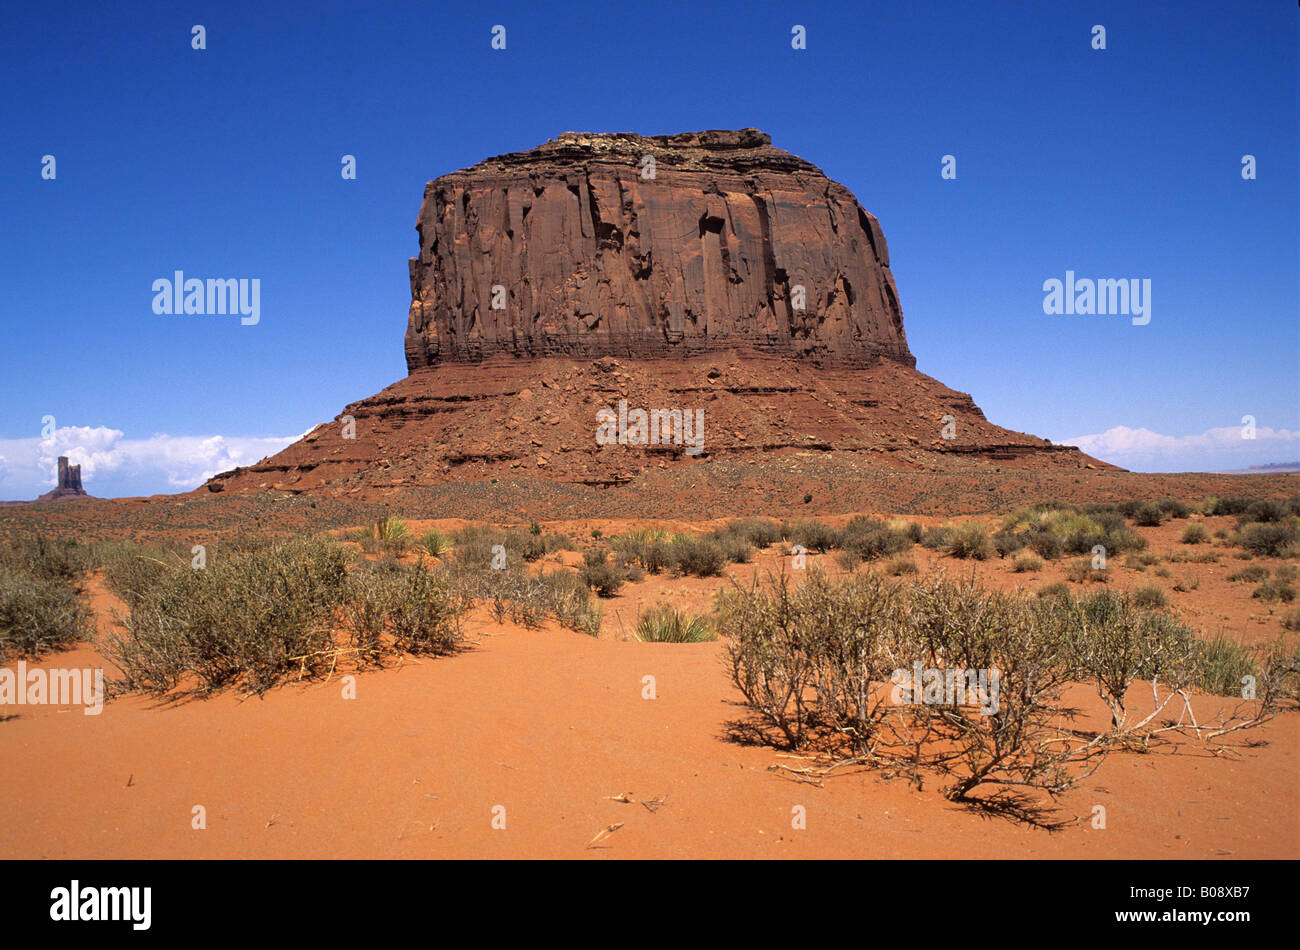 Monument Valley, Southwest USA - Stock Image